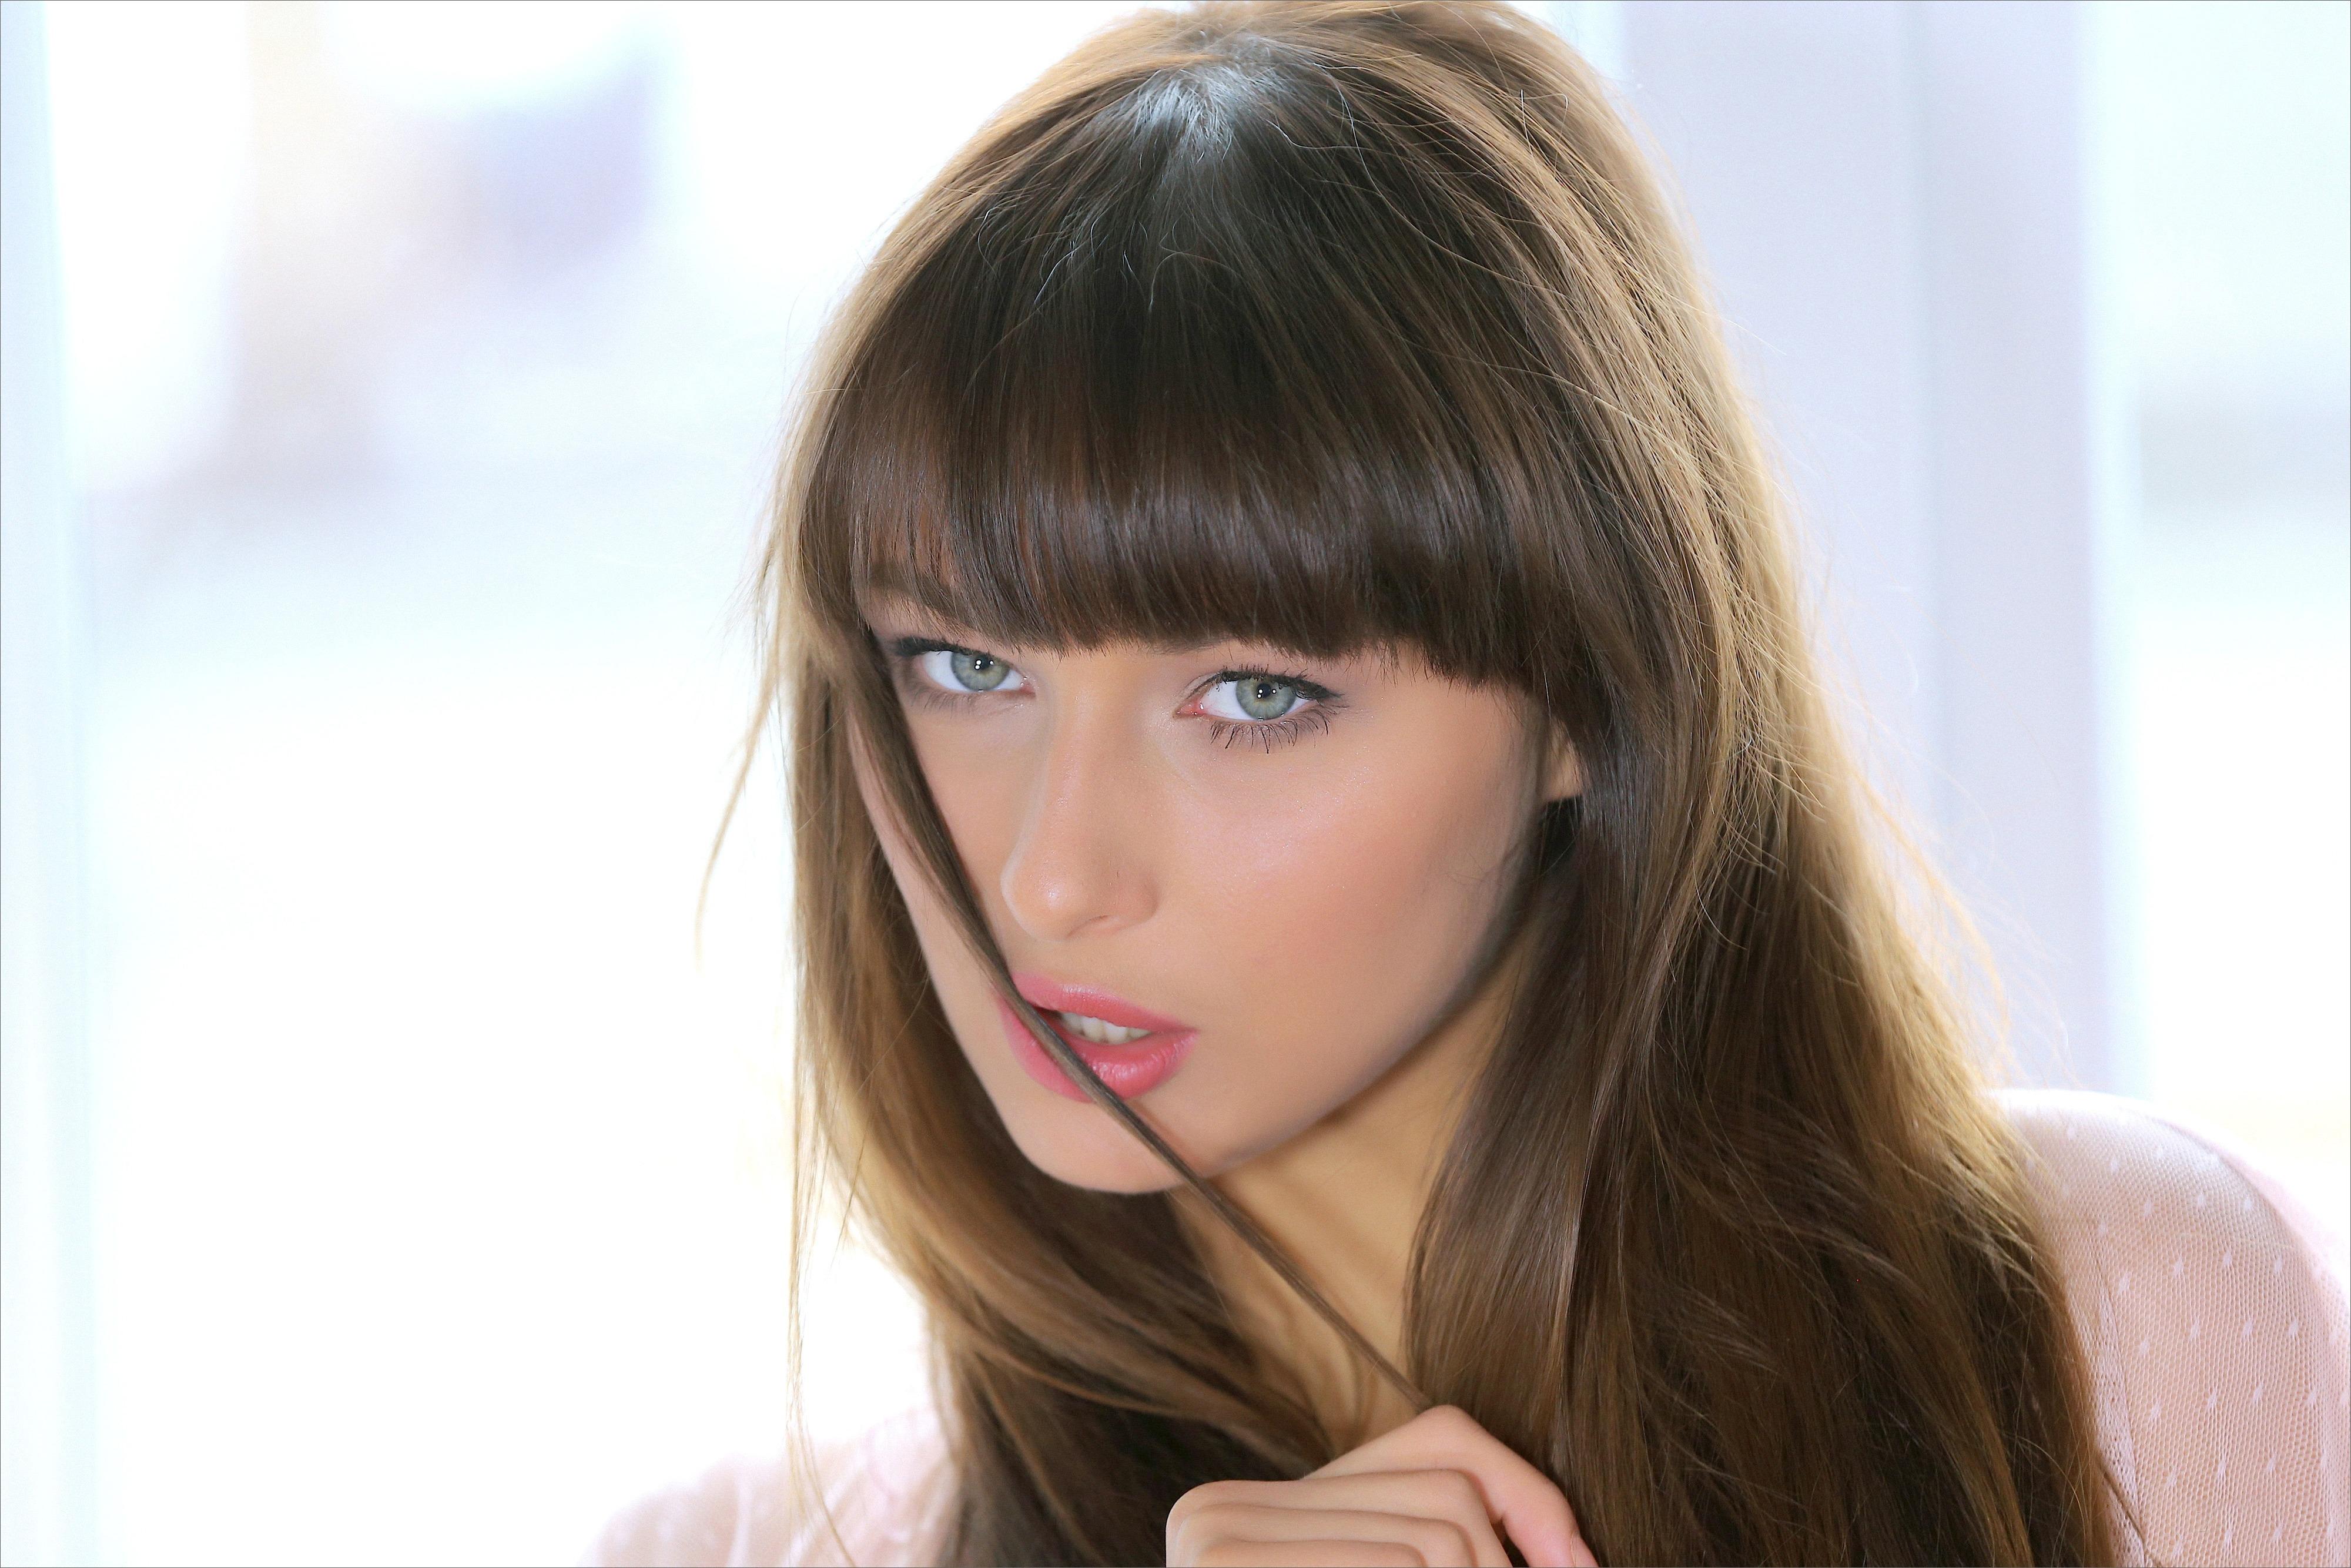 yarina p sexy girl face eyes long hair bru te   id 172745